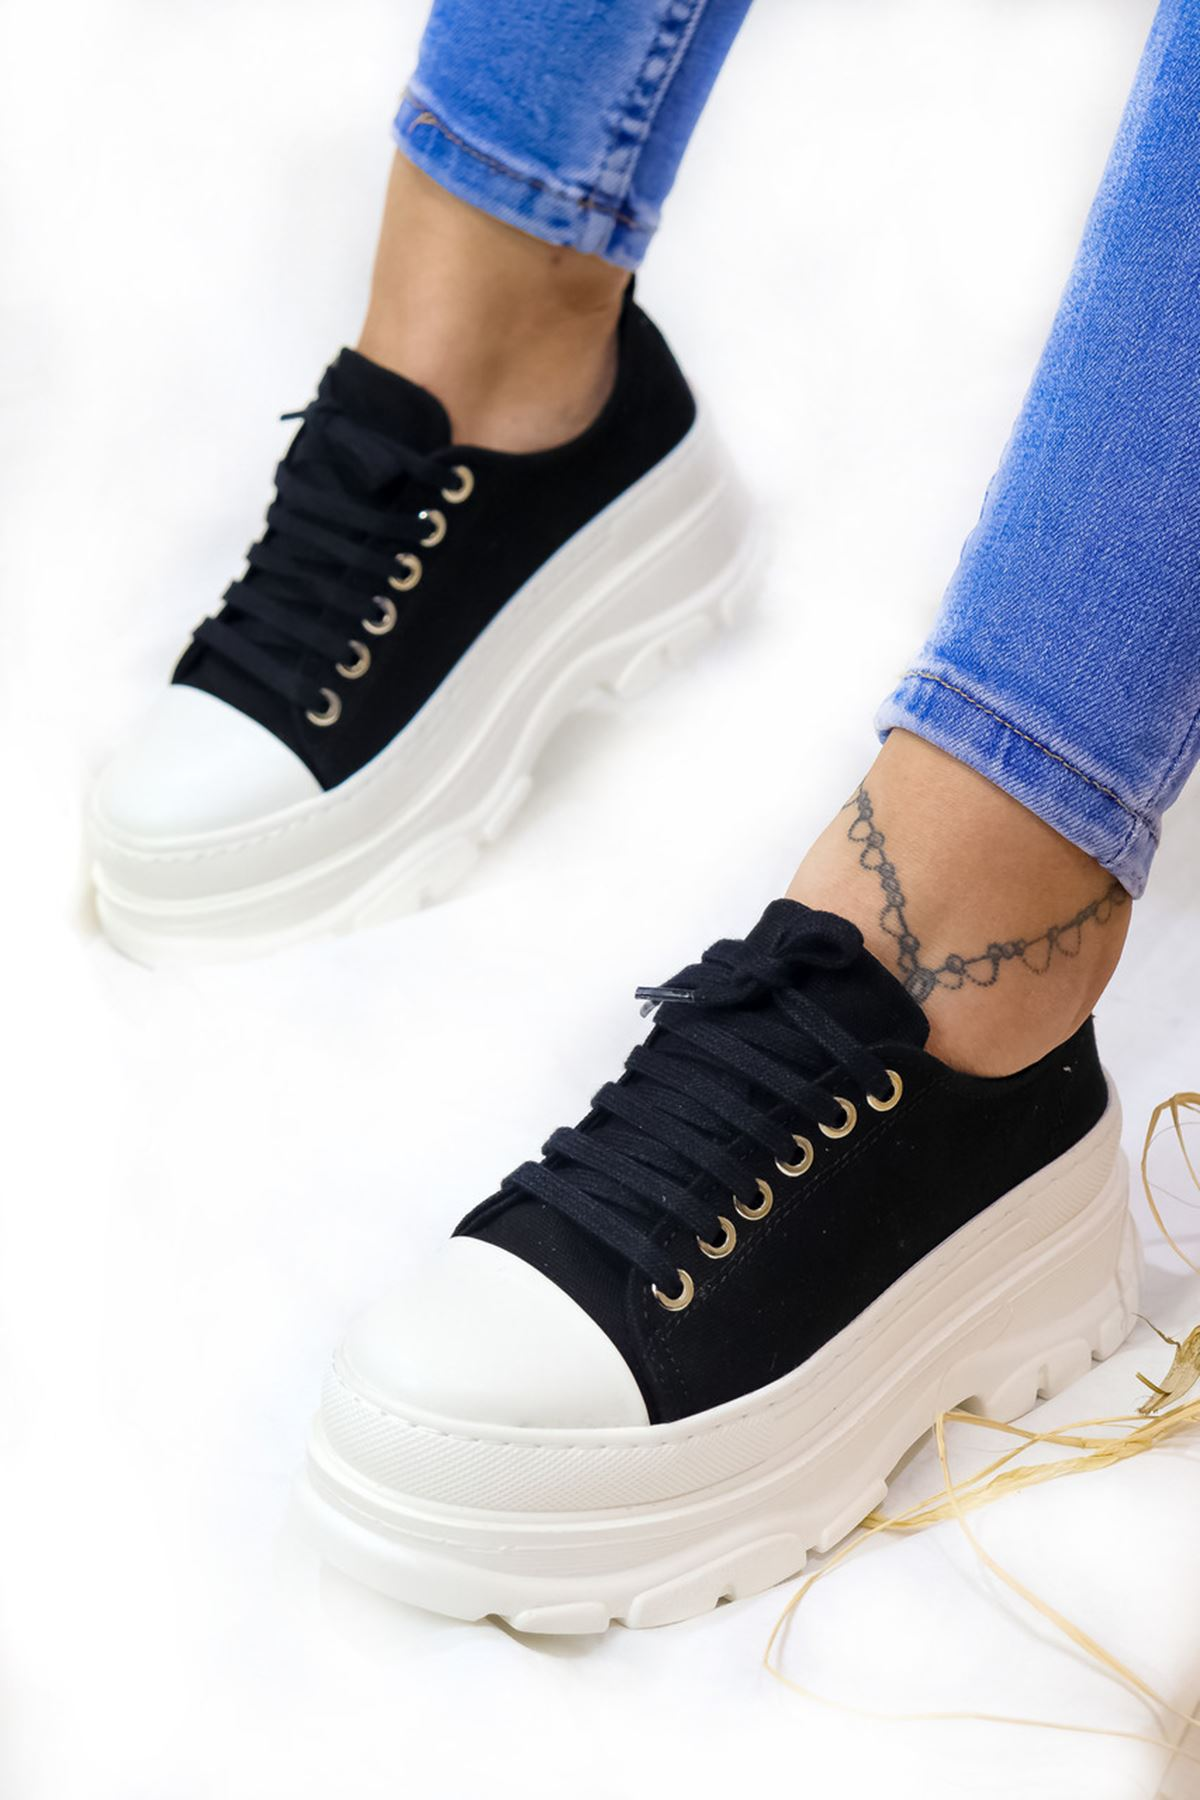 Trendayakkabı - Siyah Yüksek Topuk Convers